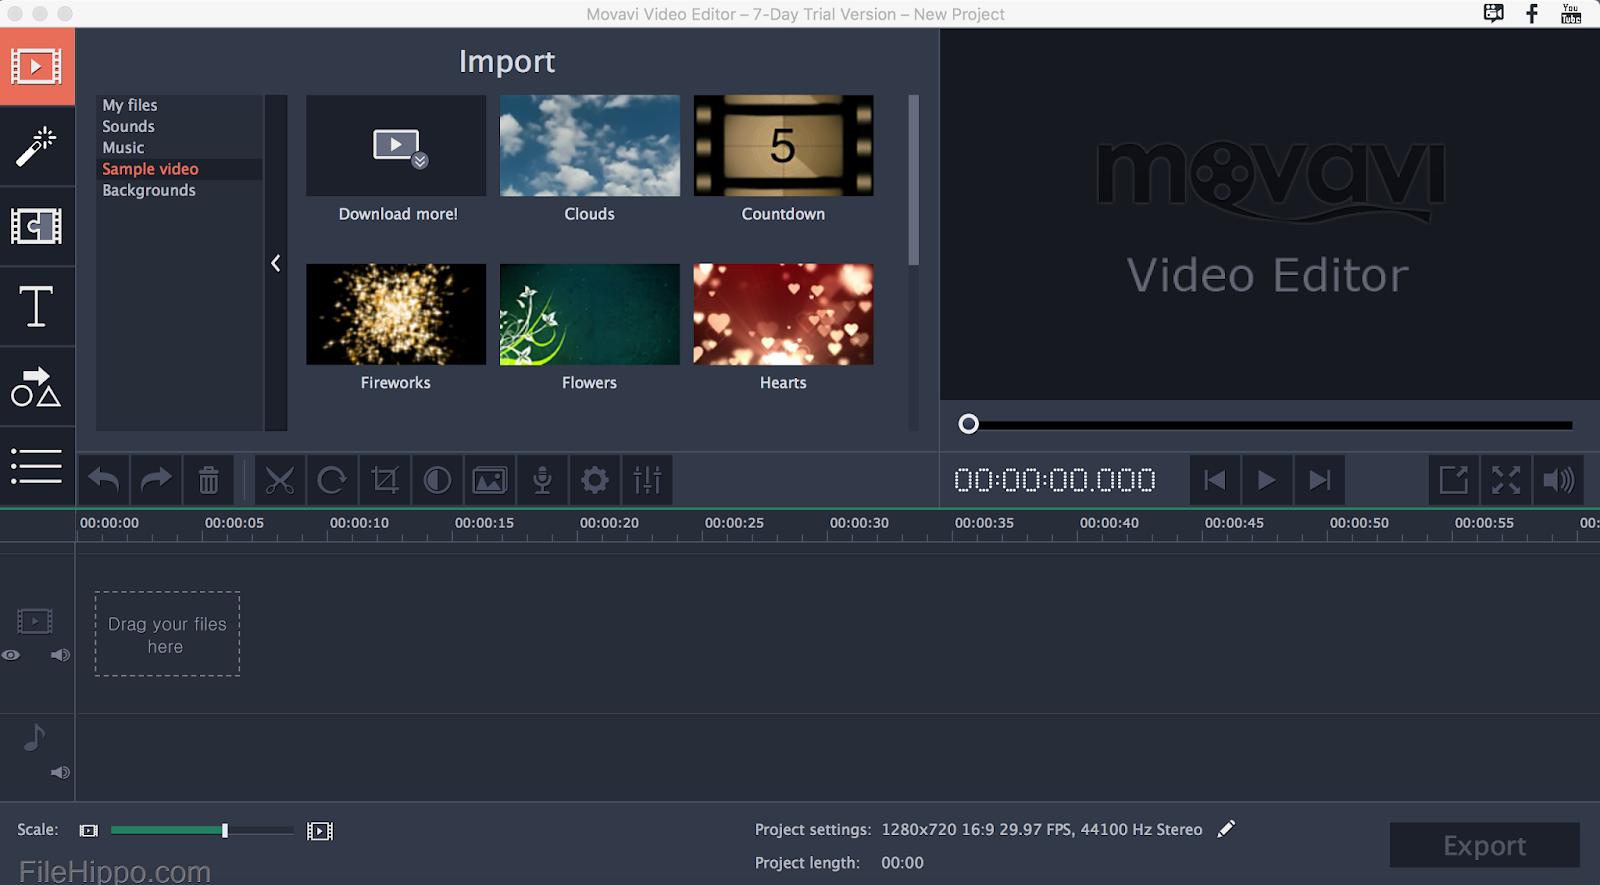 تحميل برنامج movavi video editor 14